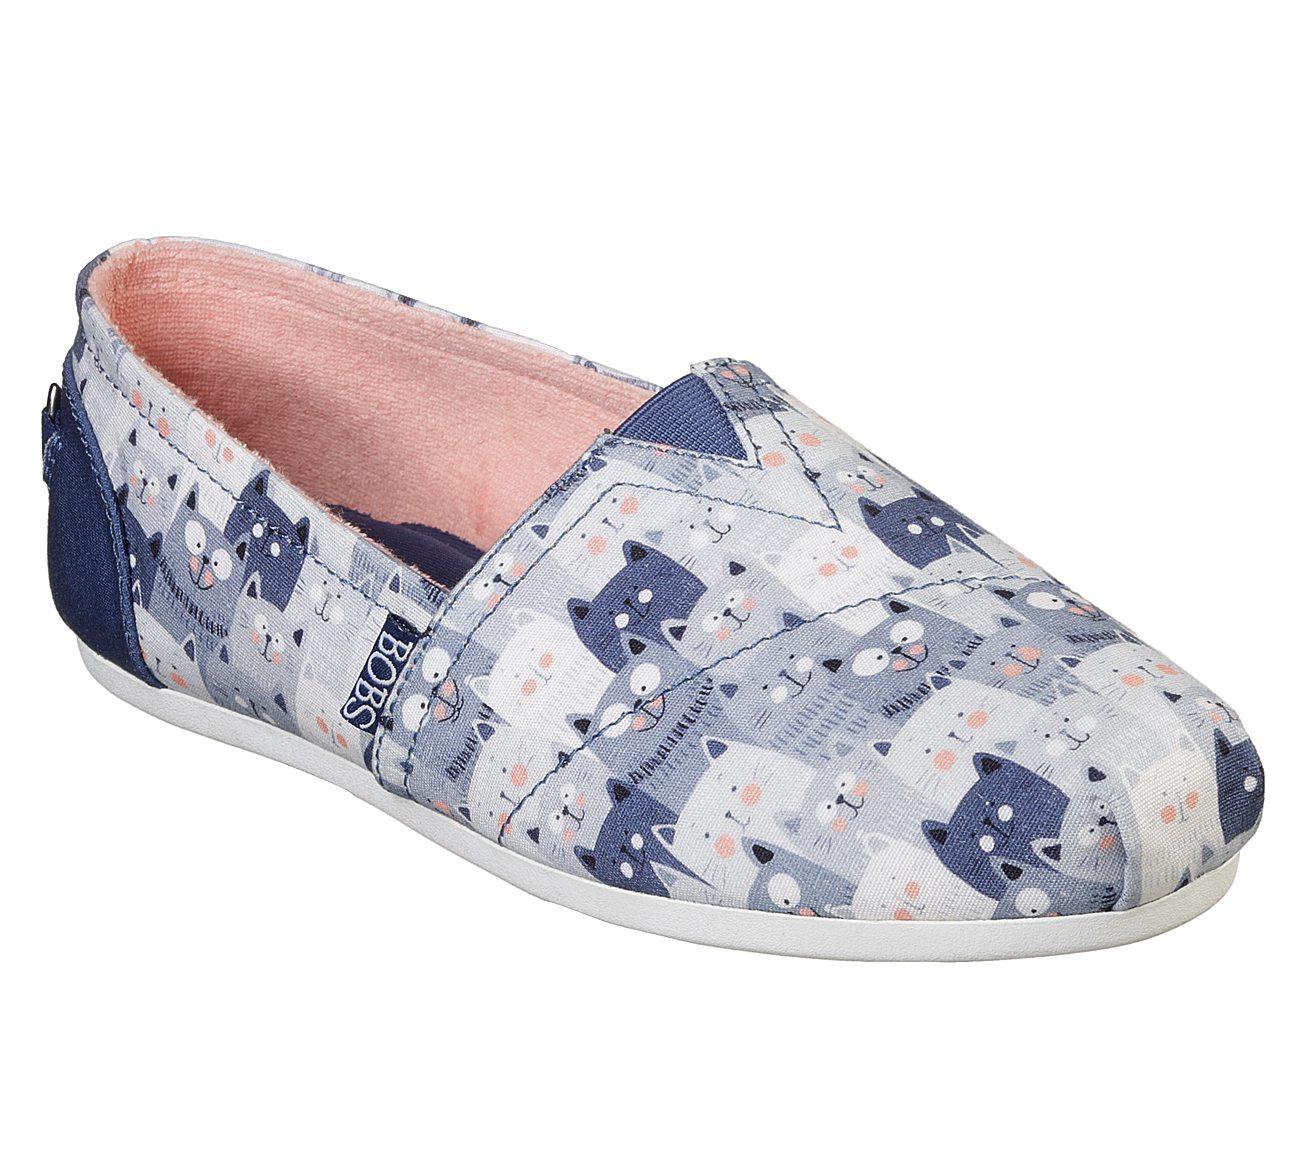 SKECHERS BOBS Plush - Kitty Jam BOBS Shoes